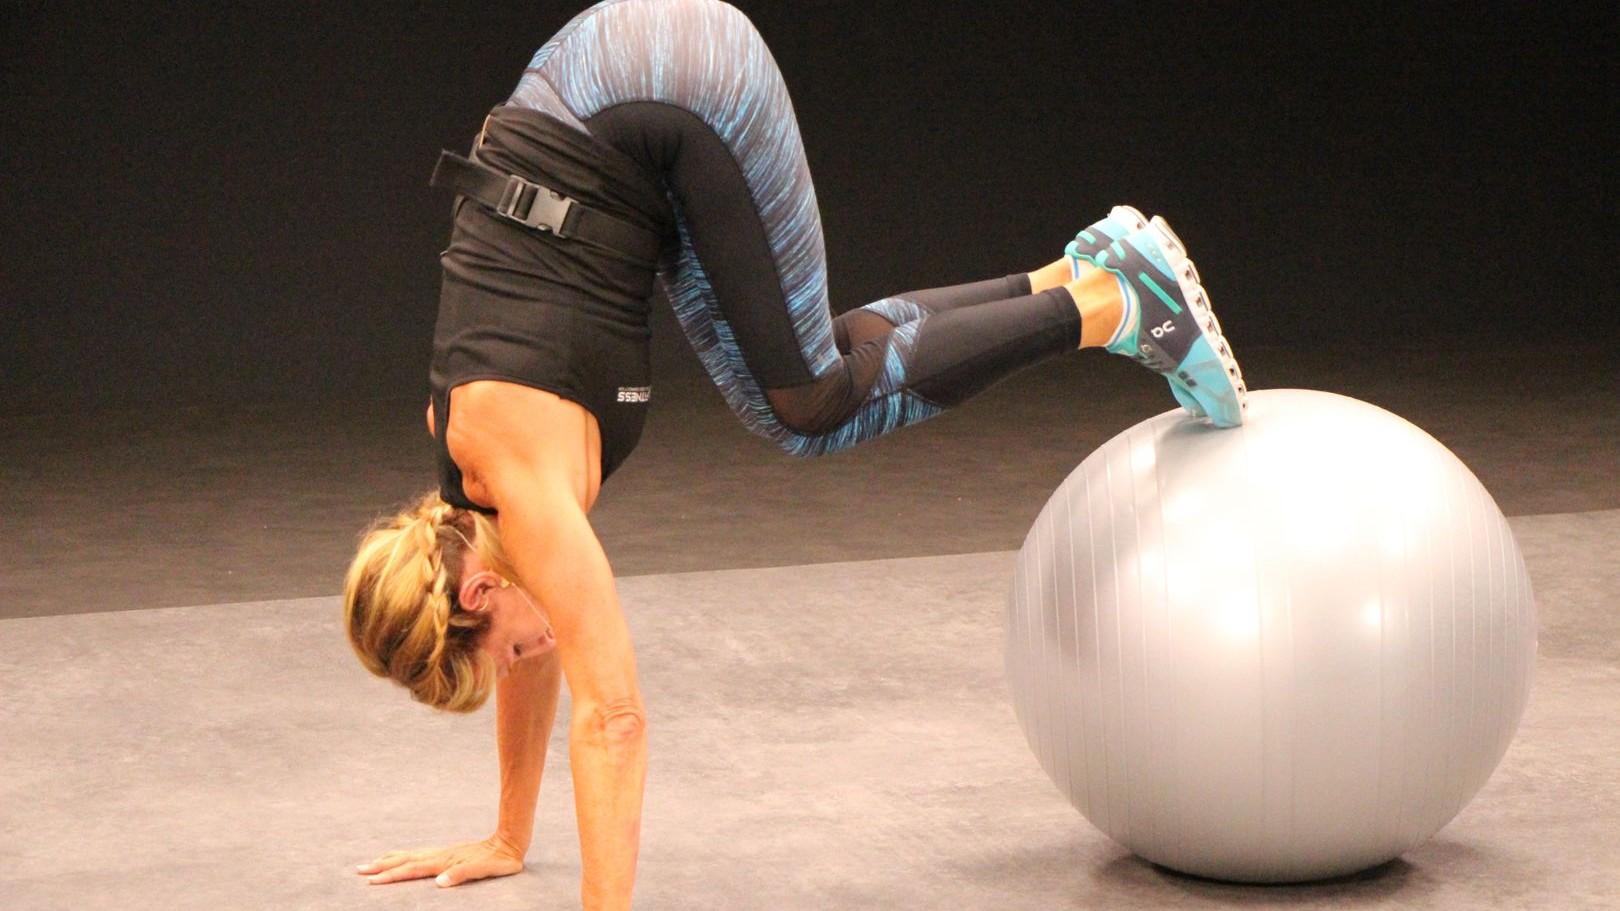 Représentation de la formation : Swiss Ball - Stability Ball